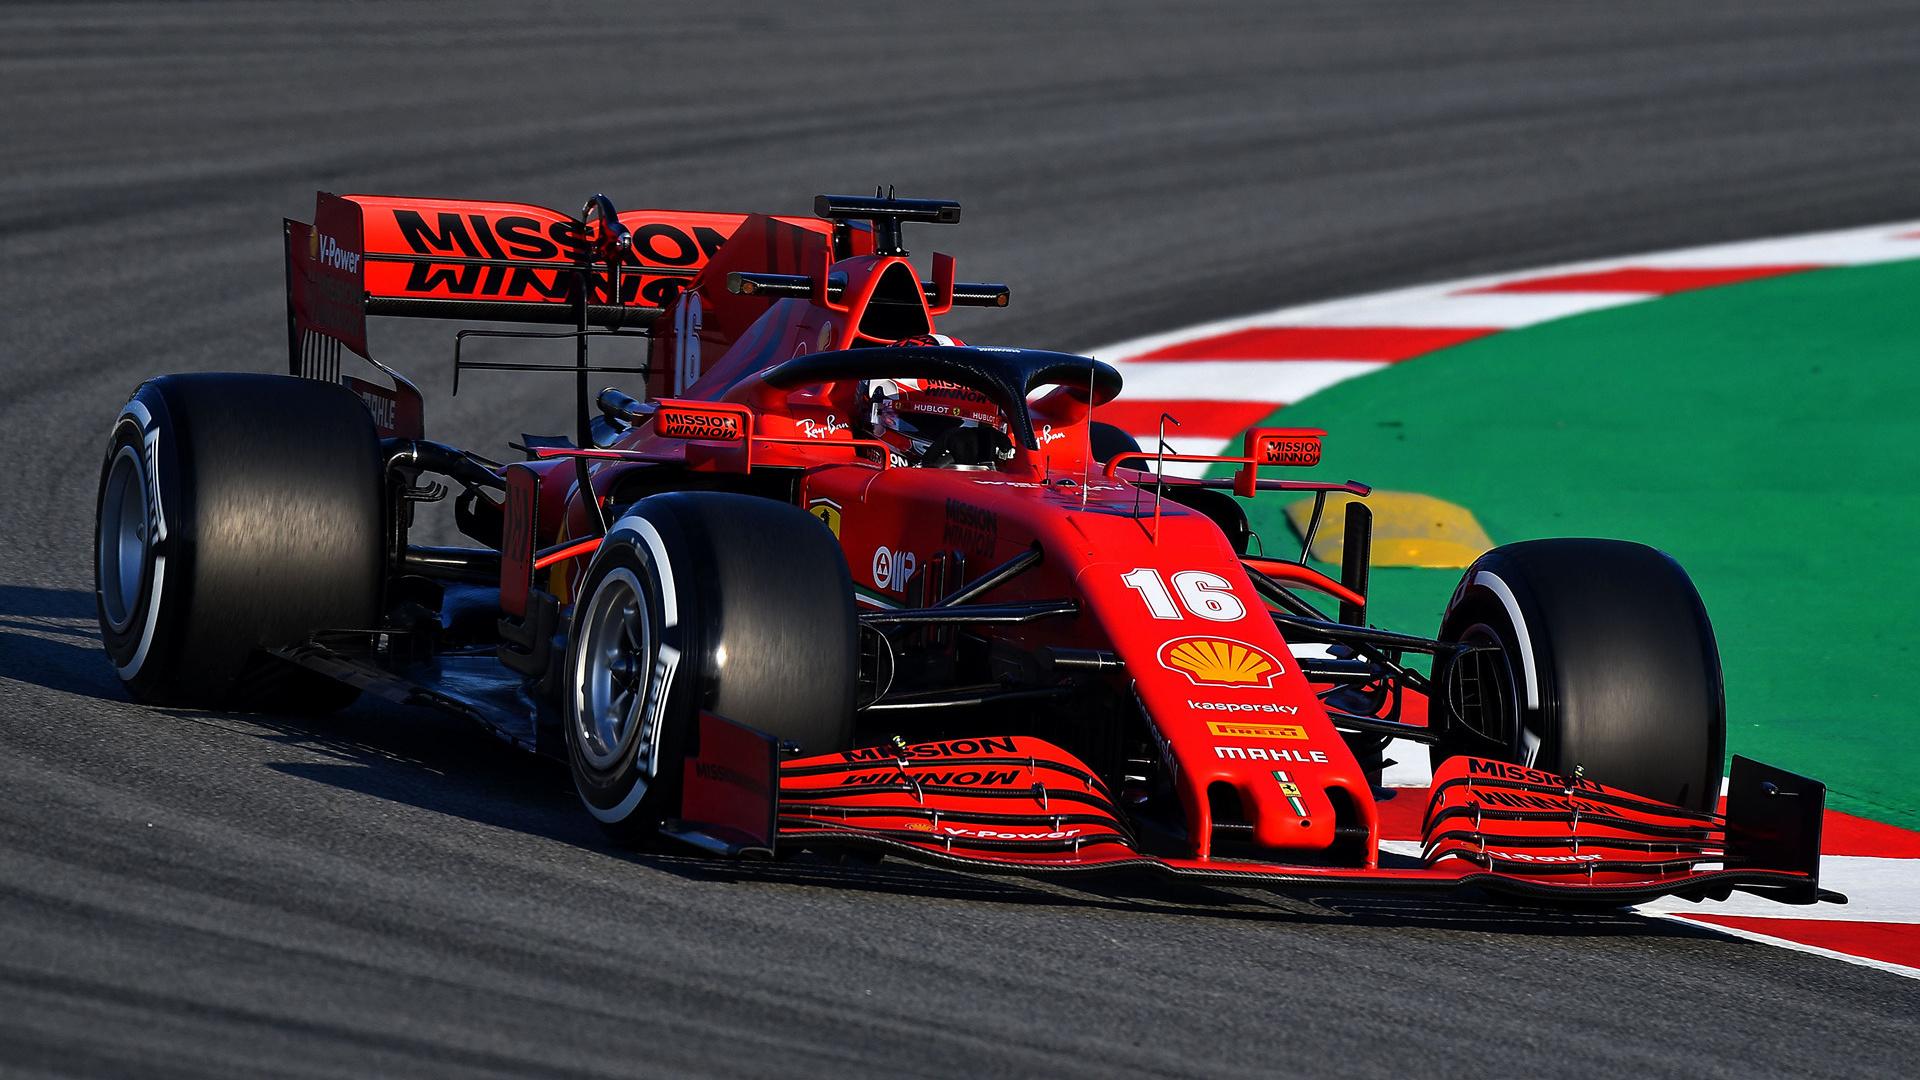 2020 Ferrari Sf1000 Wallpapers And Hd Images Car Pixel